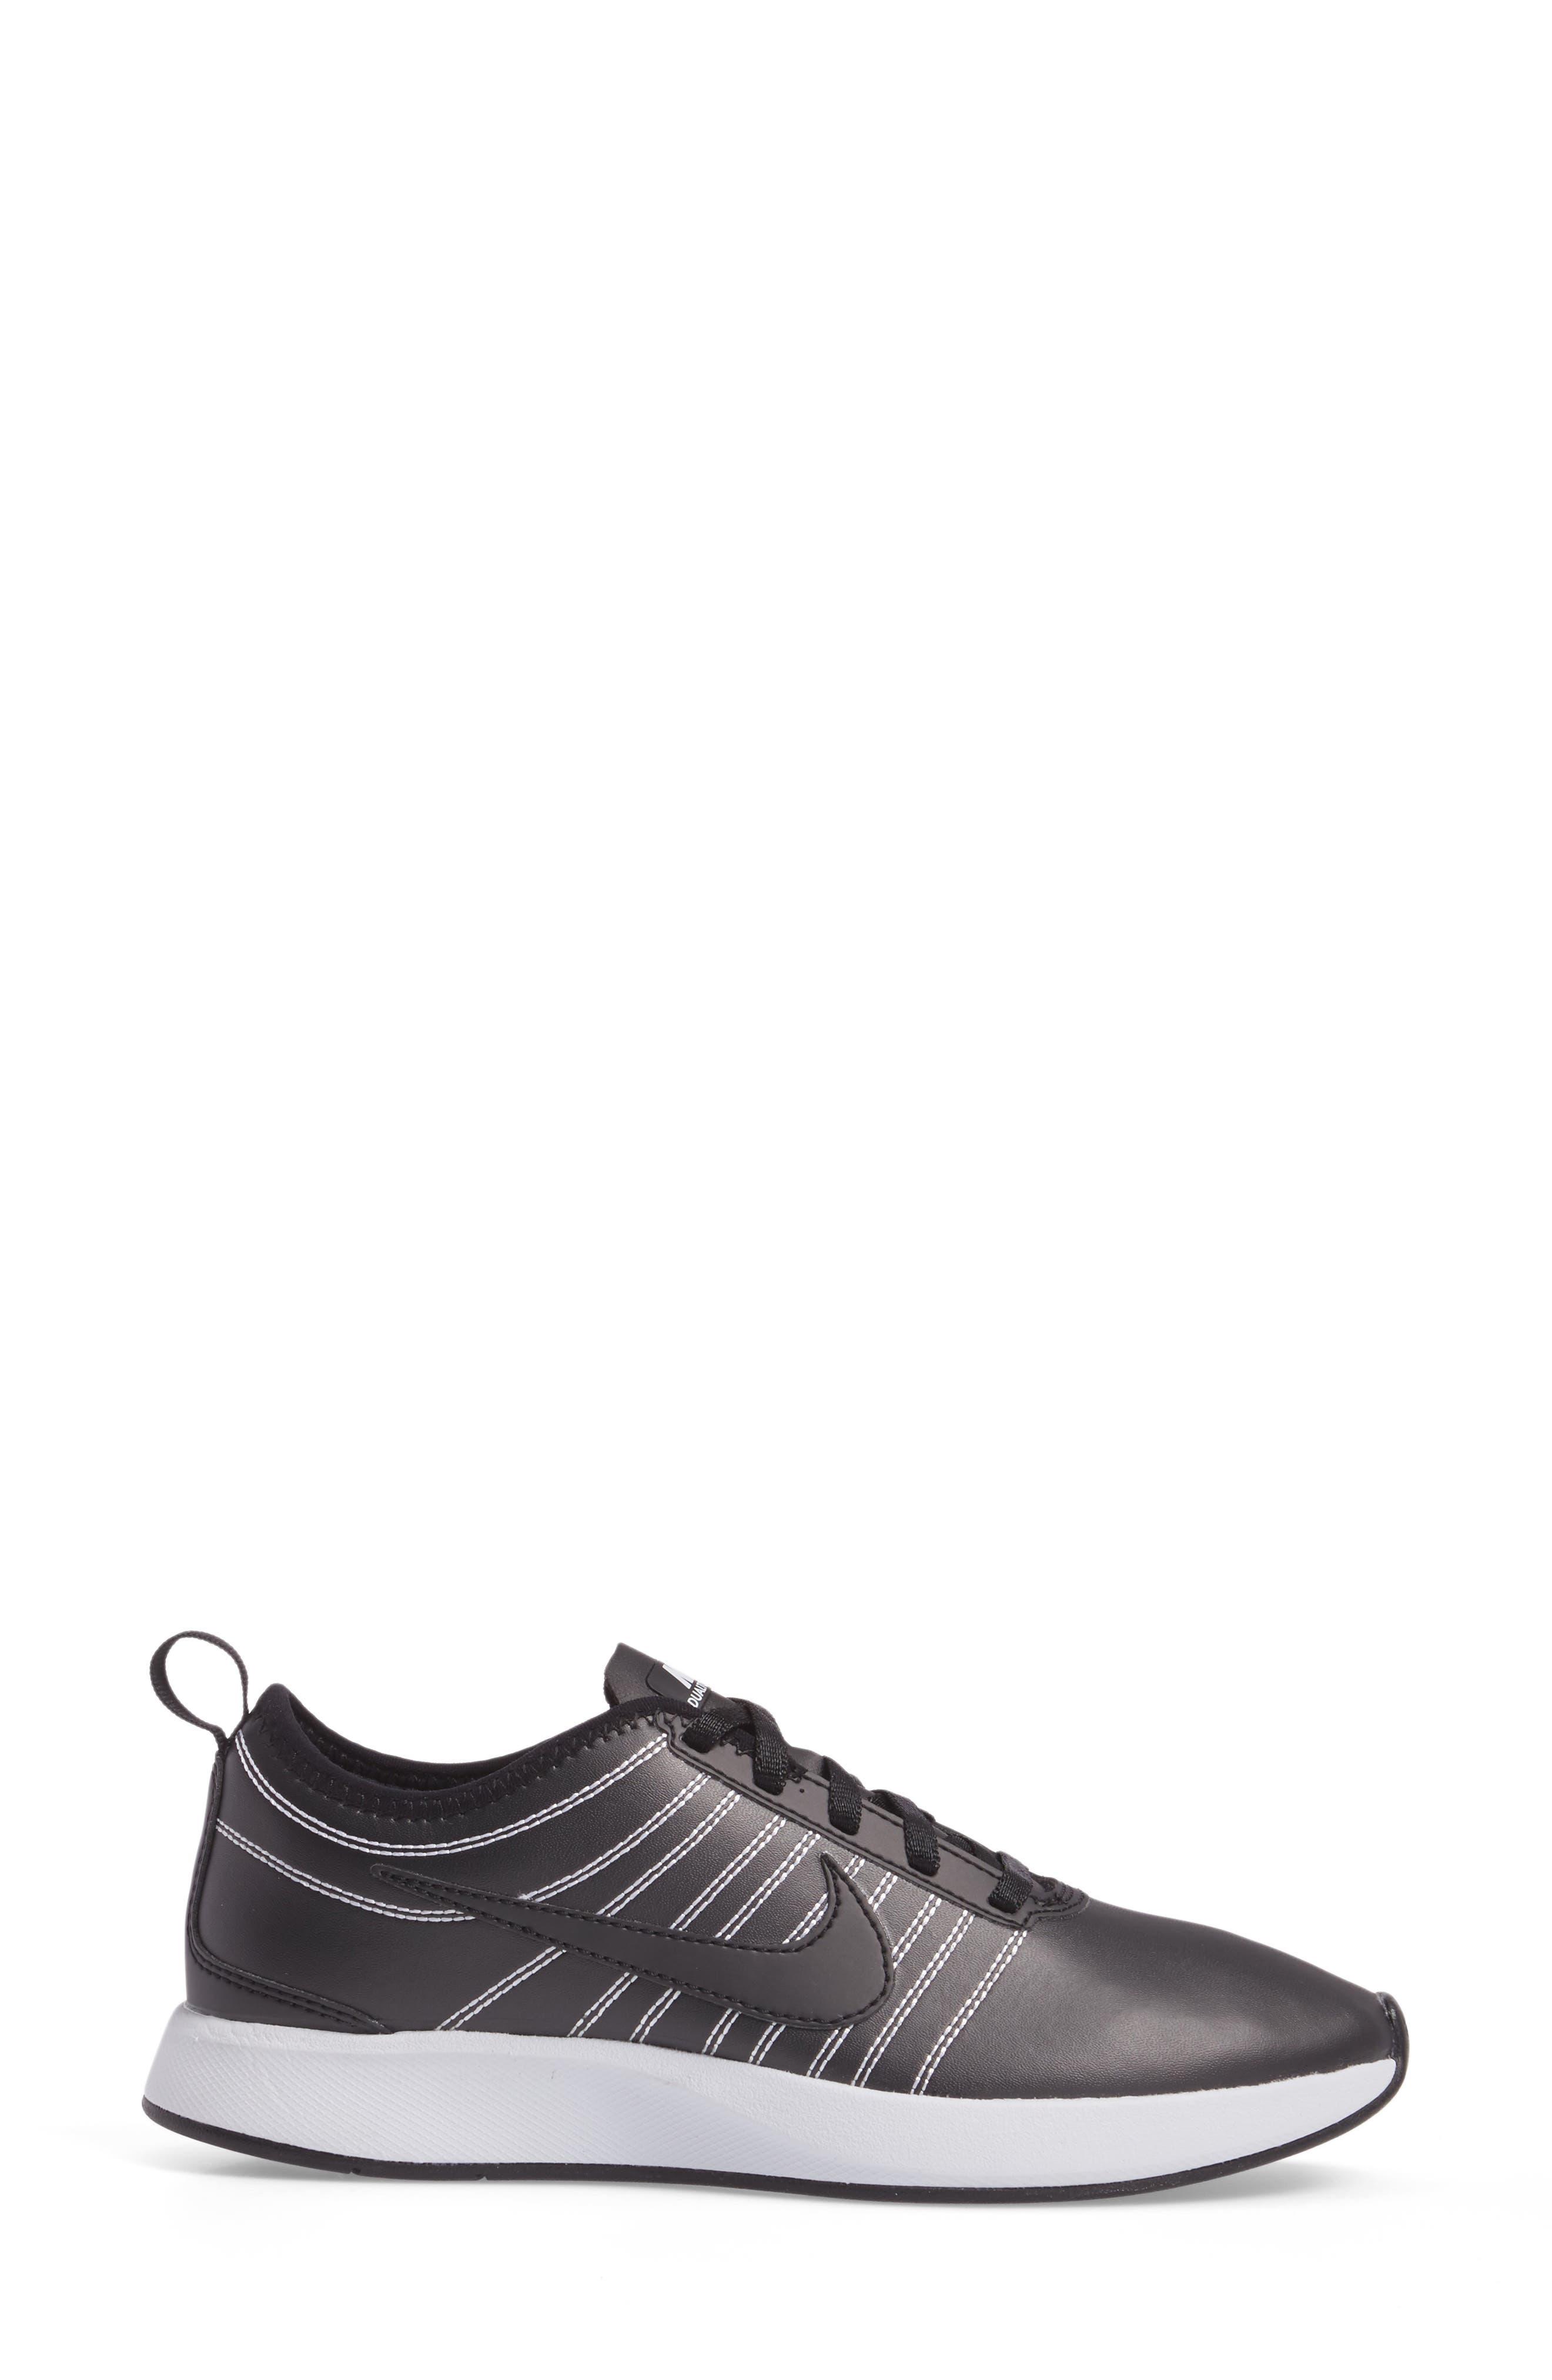 Dualtone Racer PRM Sneaker,                             Alternate thumbnail 11, color,